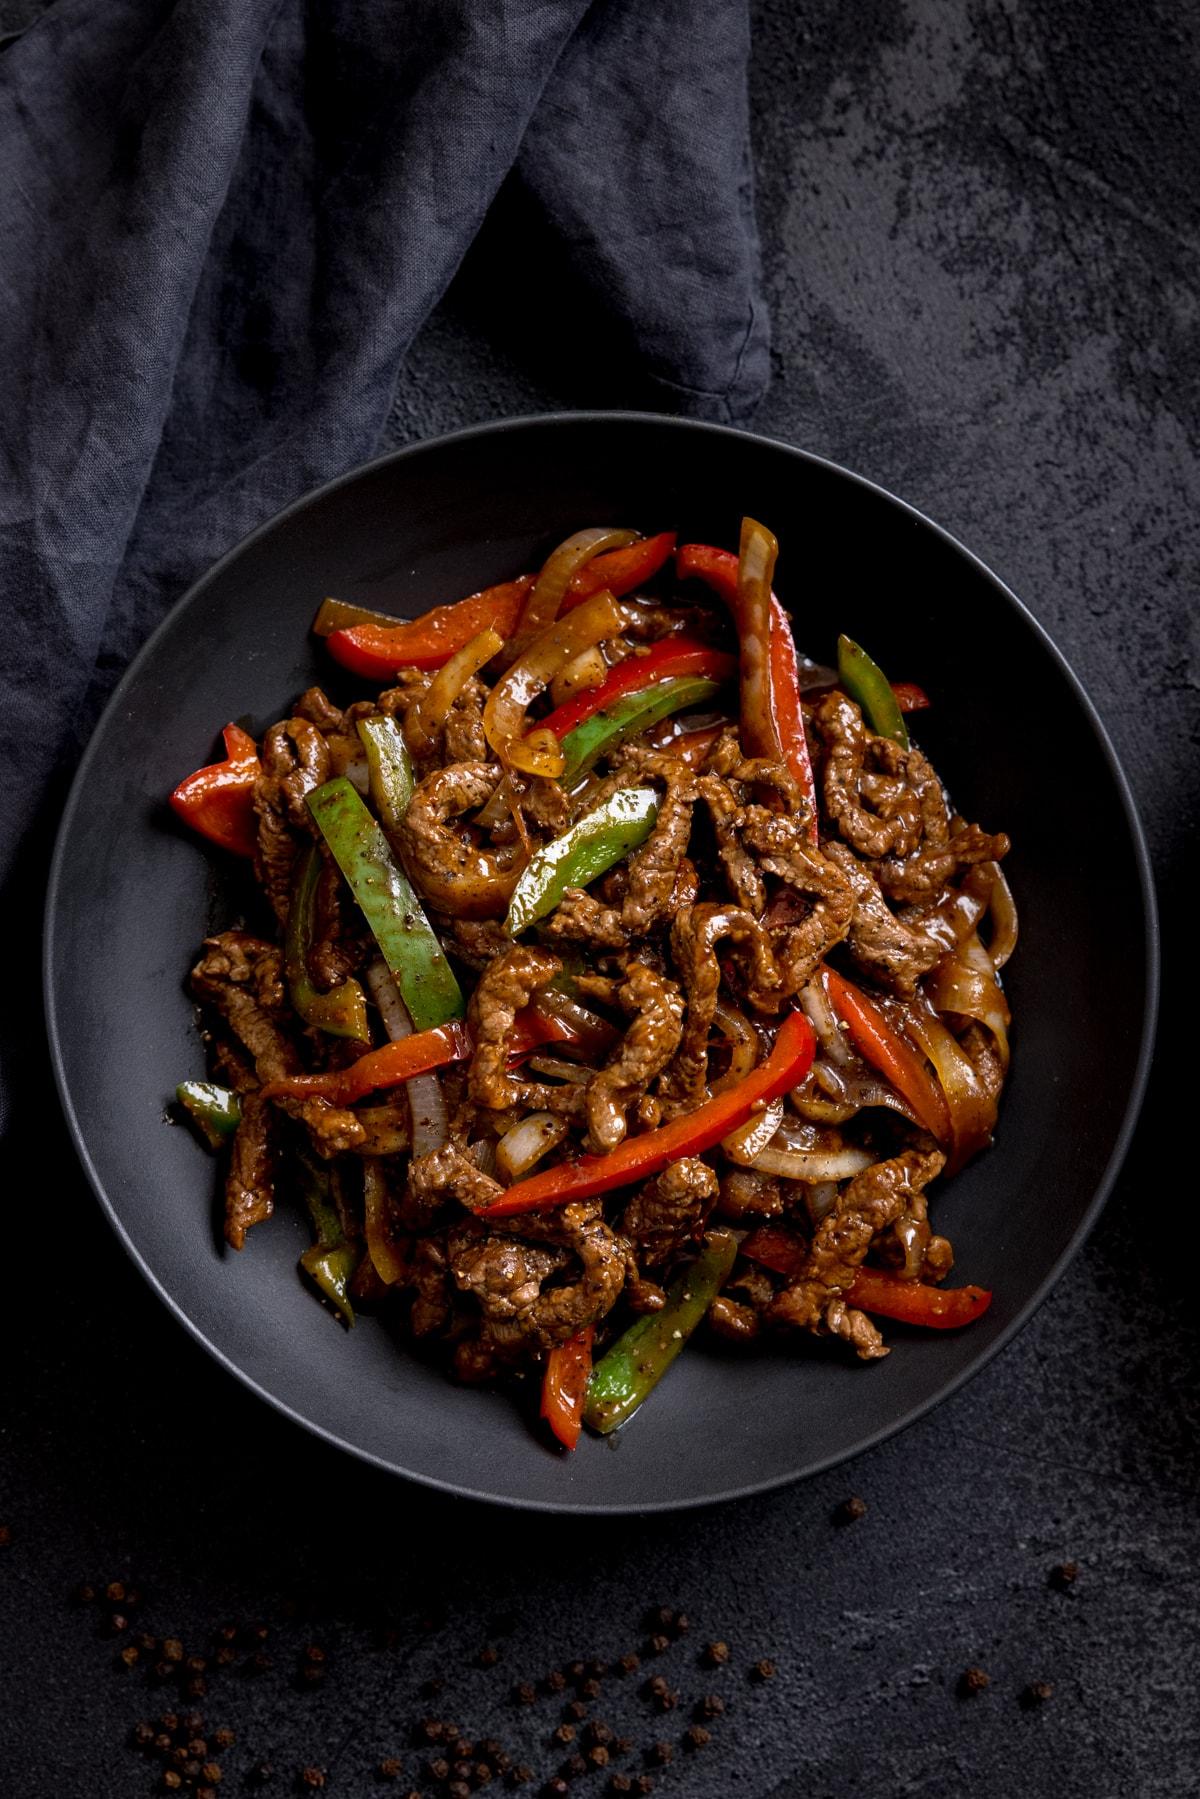 Black pepper beef stir fry in a black bowl on a dark background.